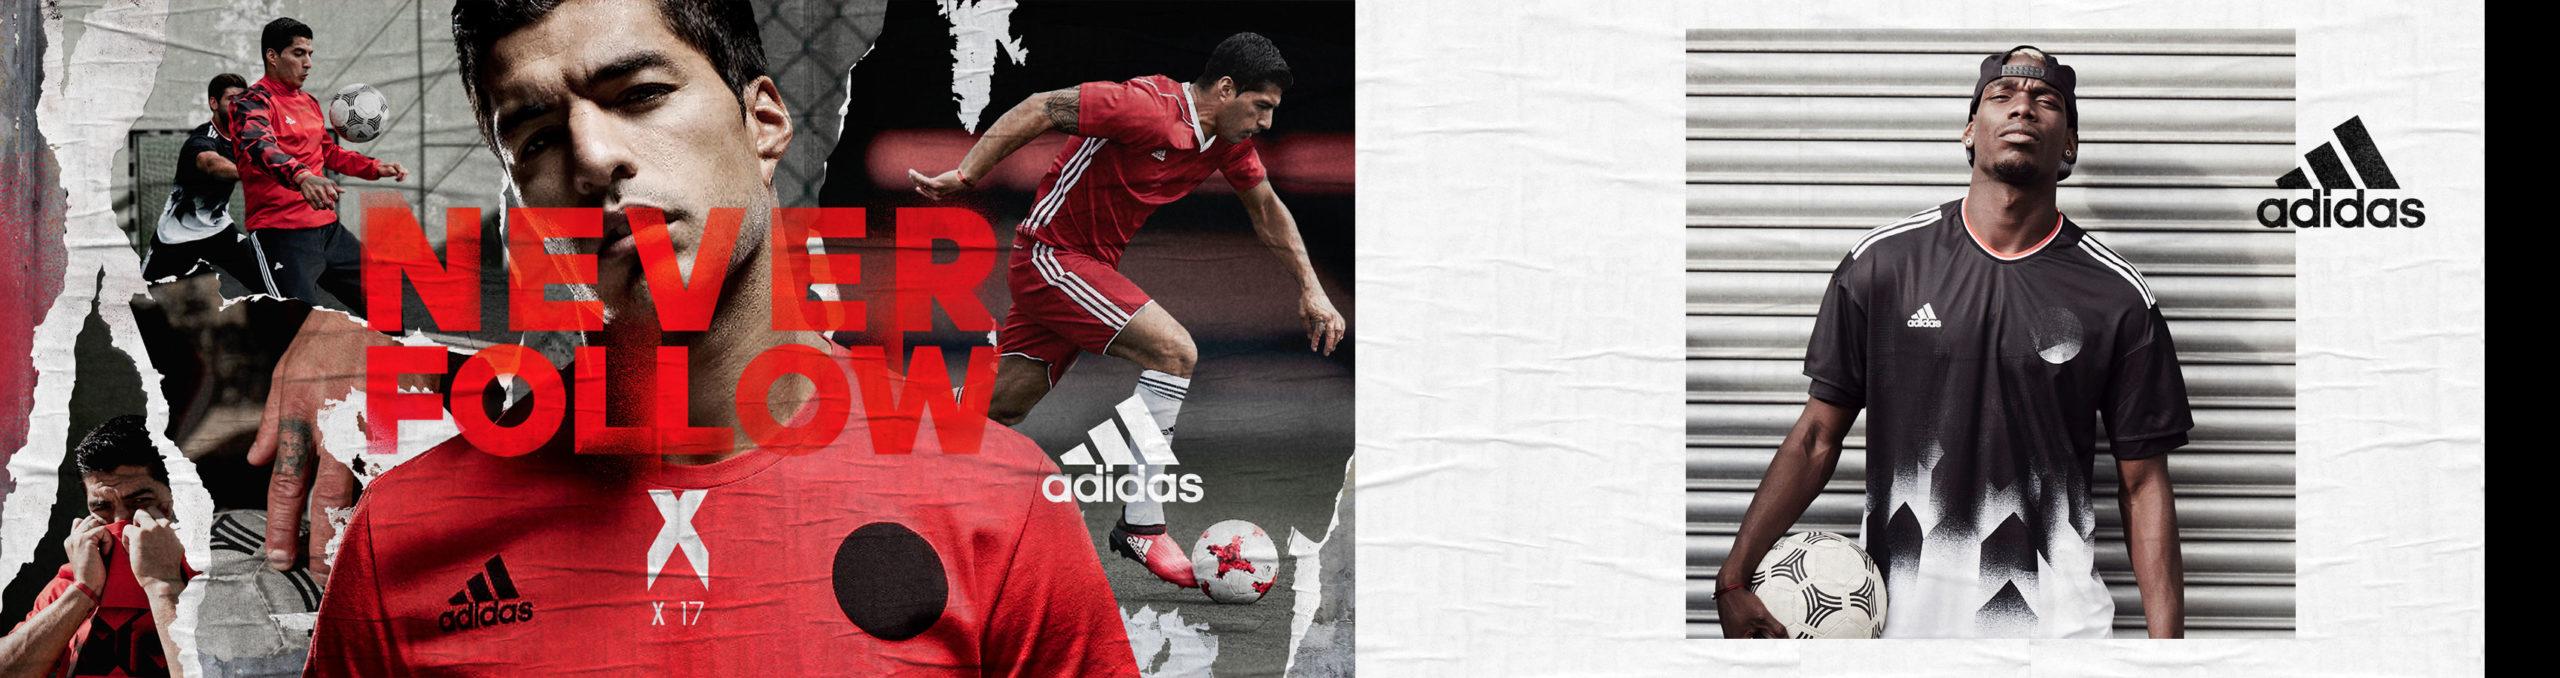 RobsonUnited2020_adidasNeverFollow_RedLimit01